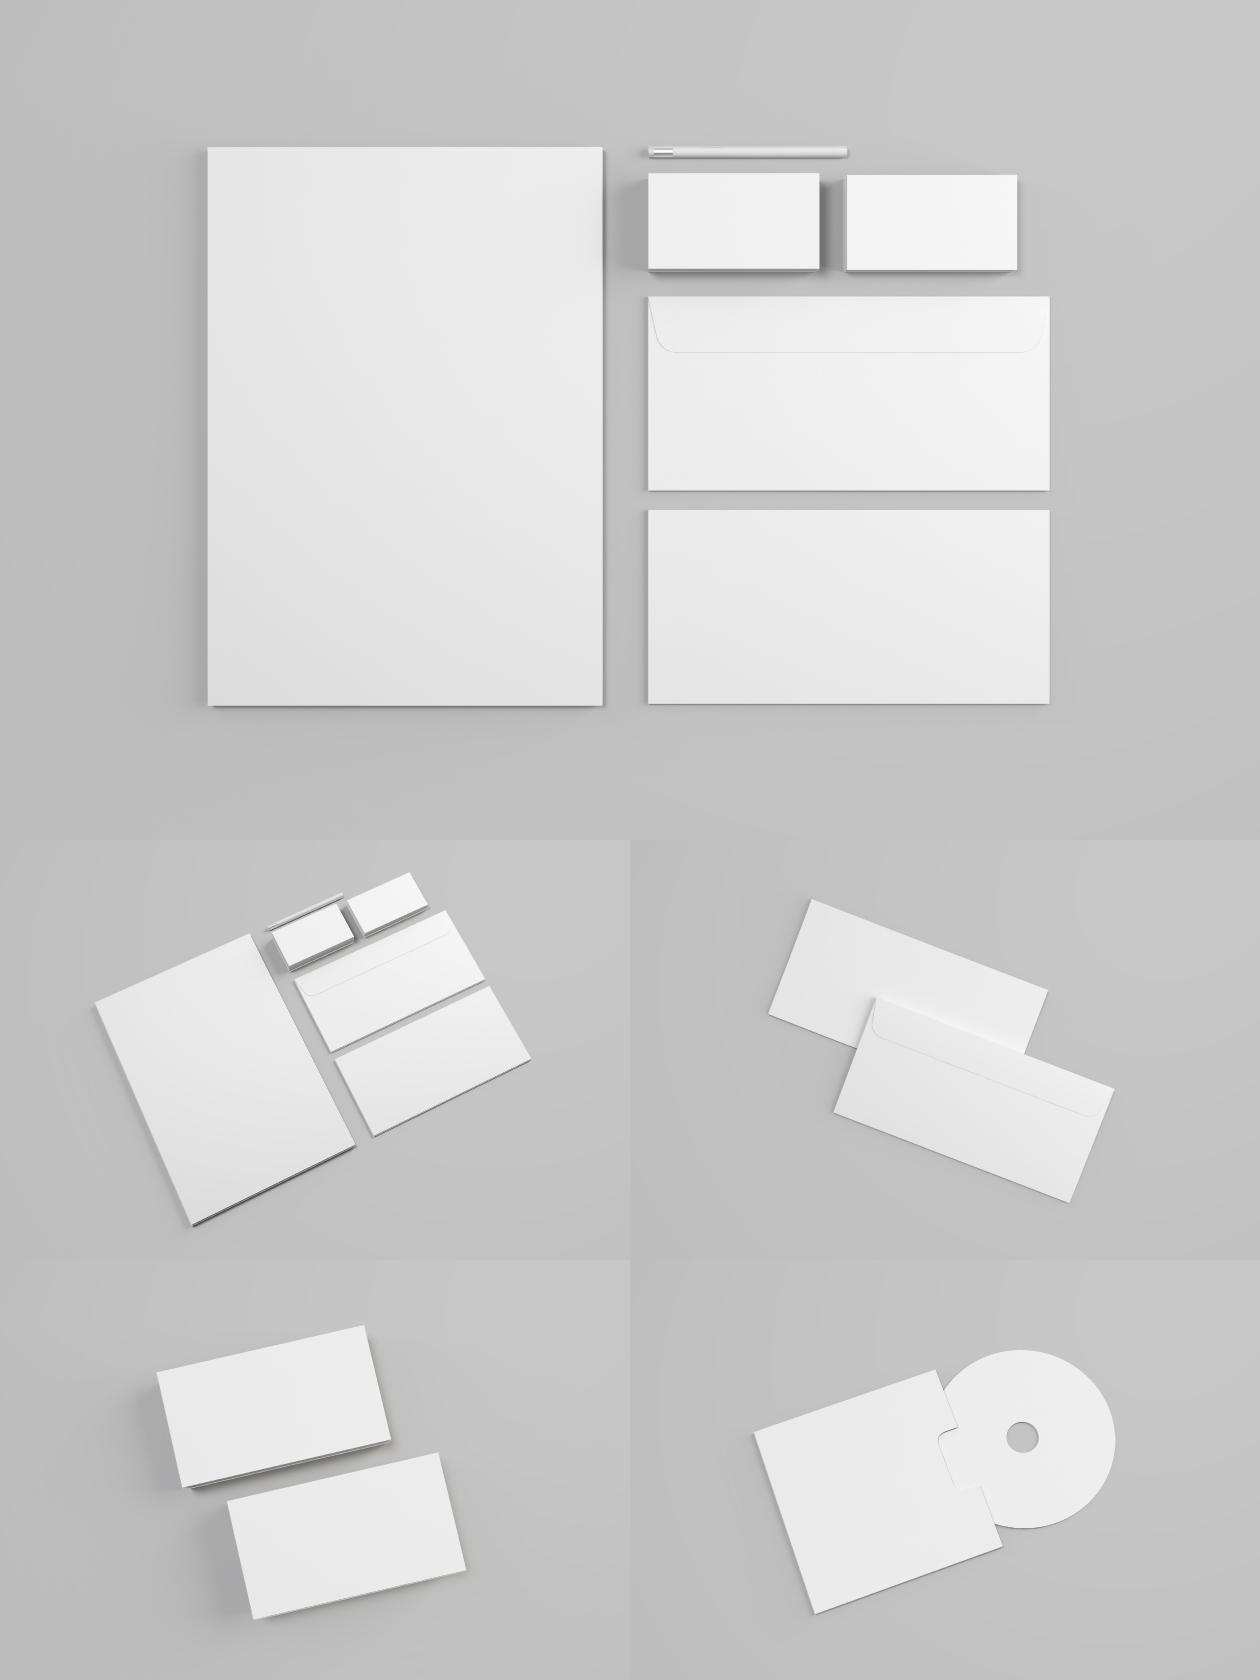 blank mockup stationery